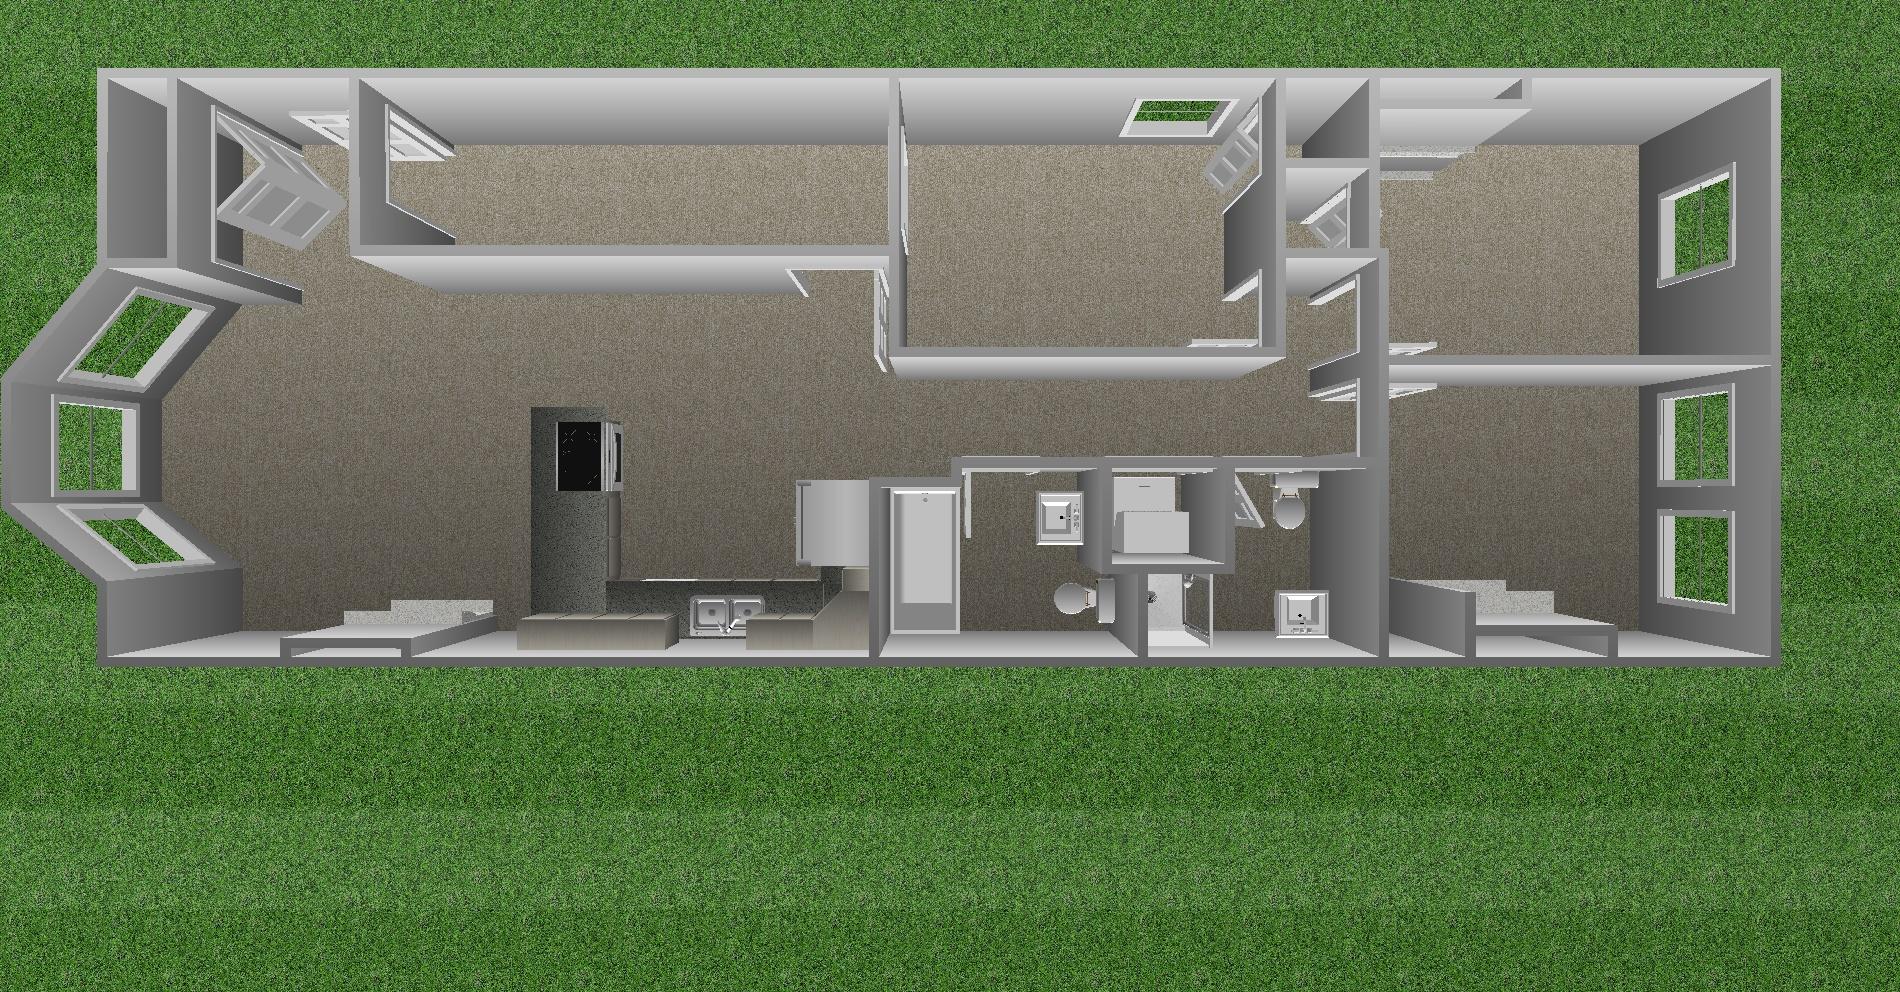 Bathroom layout question...-idea3d.jpg